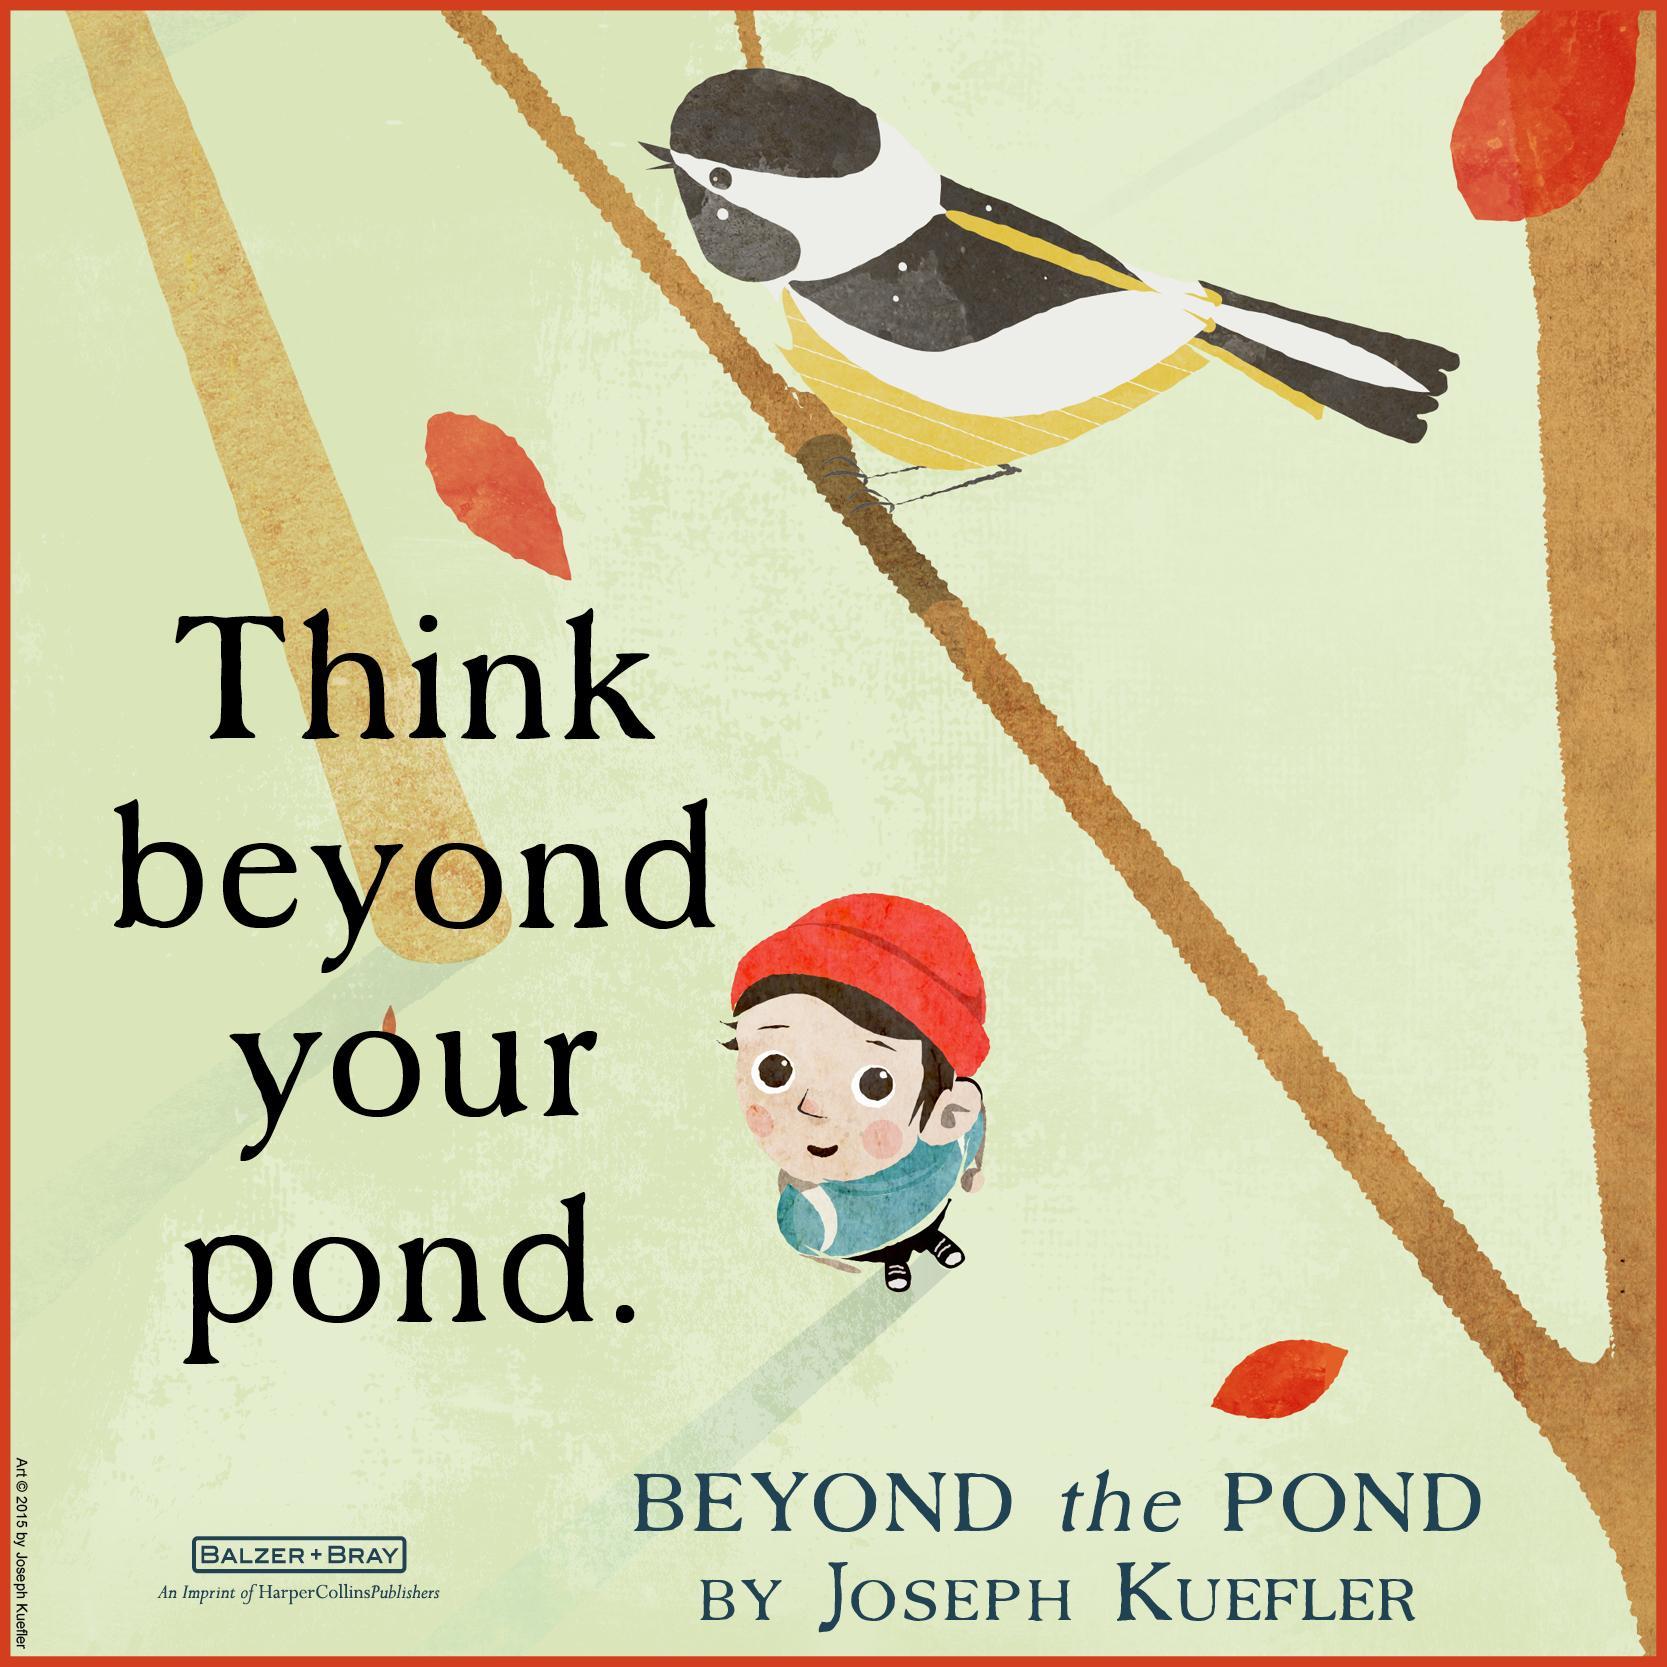 Beyond The Pond: Joseph Kuefler: 9780062364272: Amazon.com